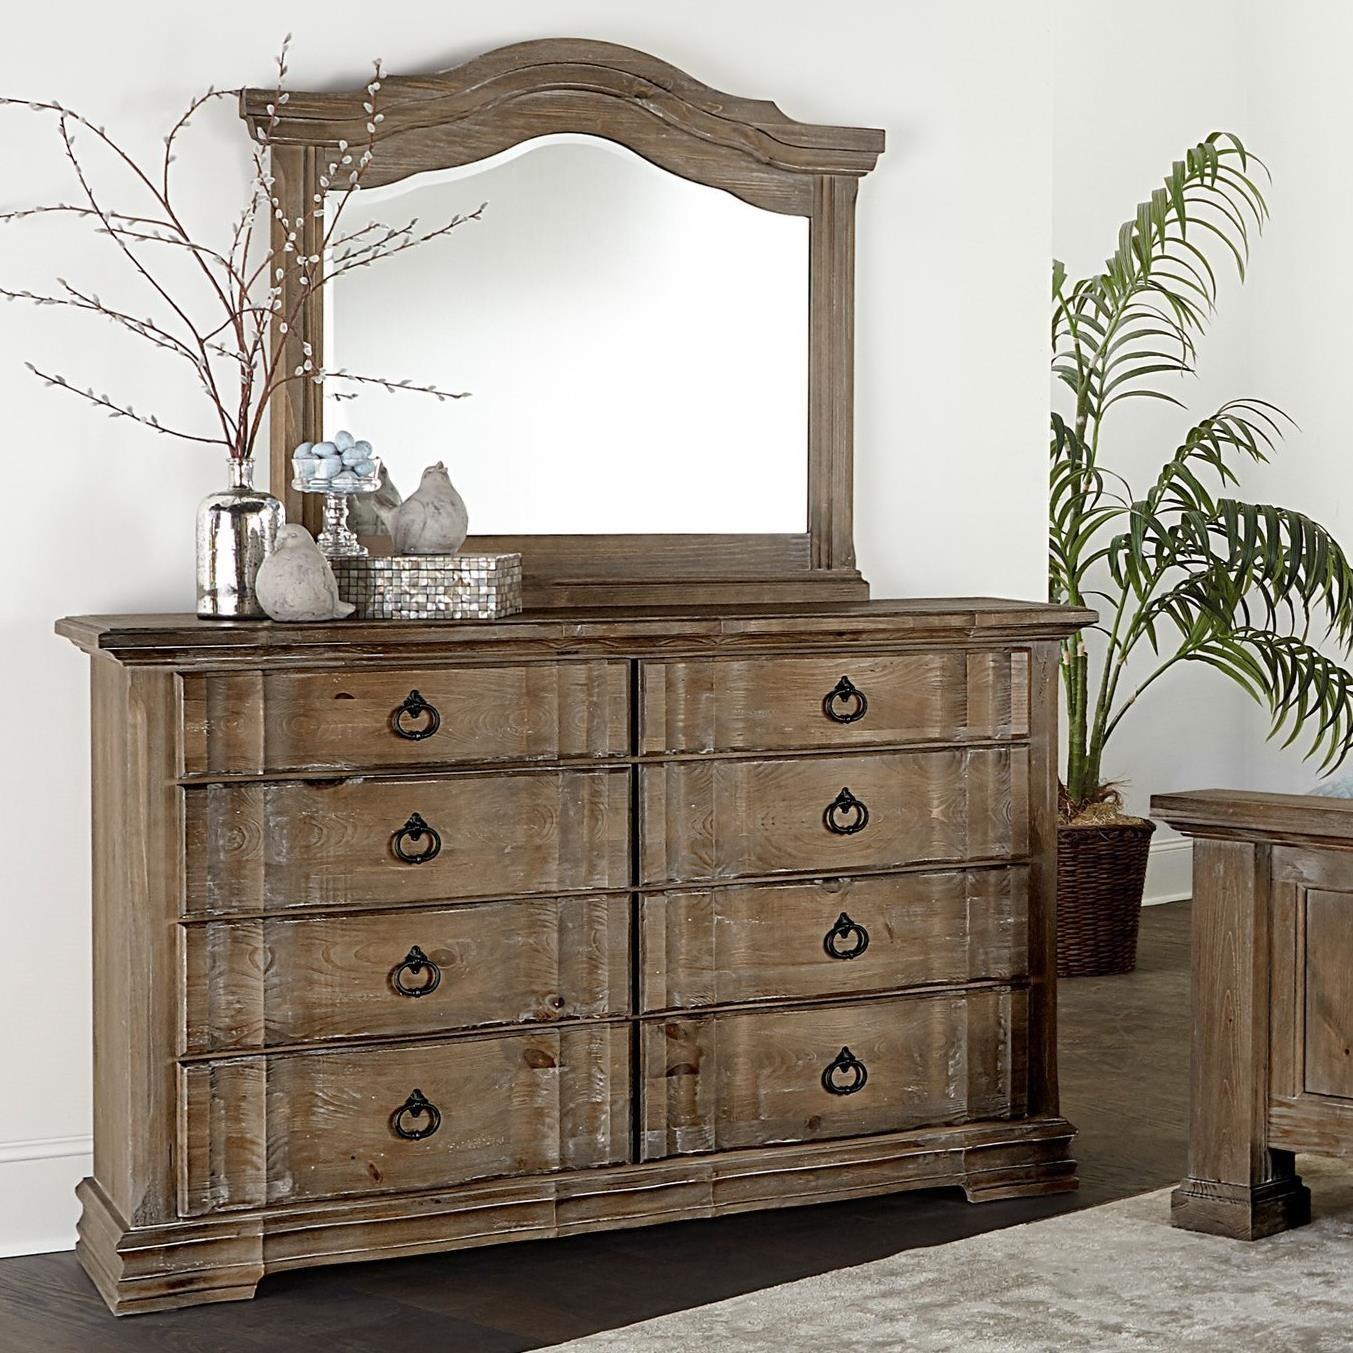 Dresser & Arched Landscape Mirror